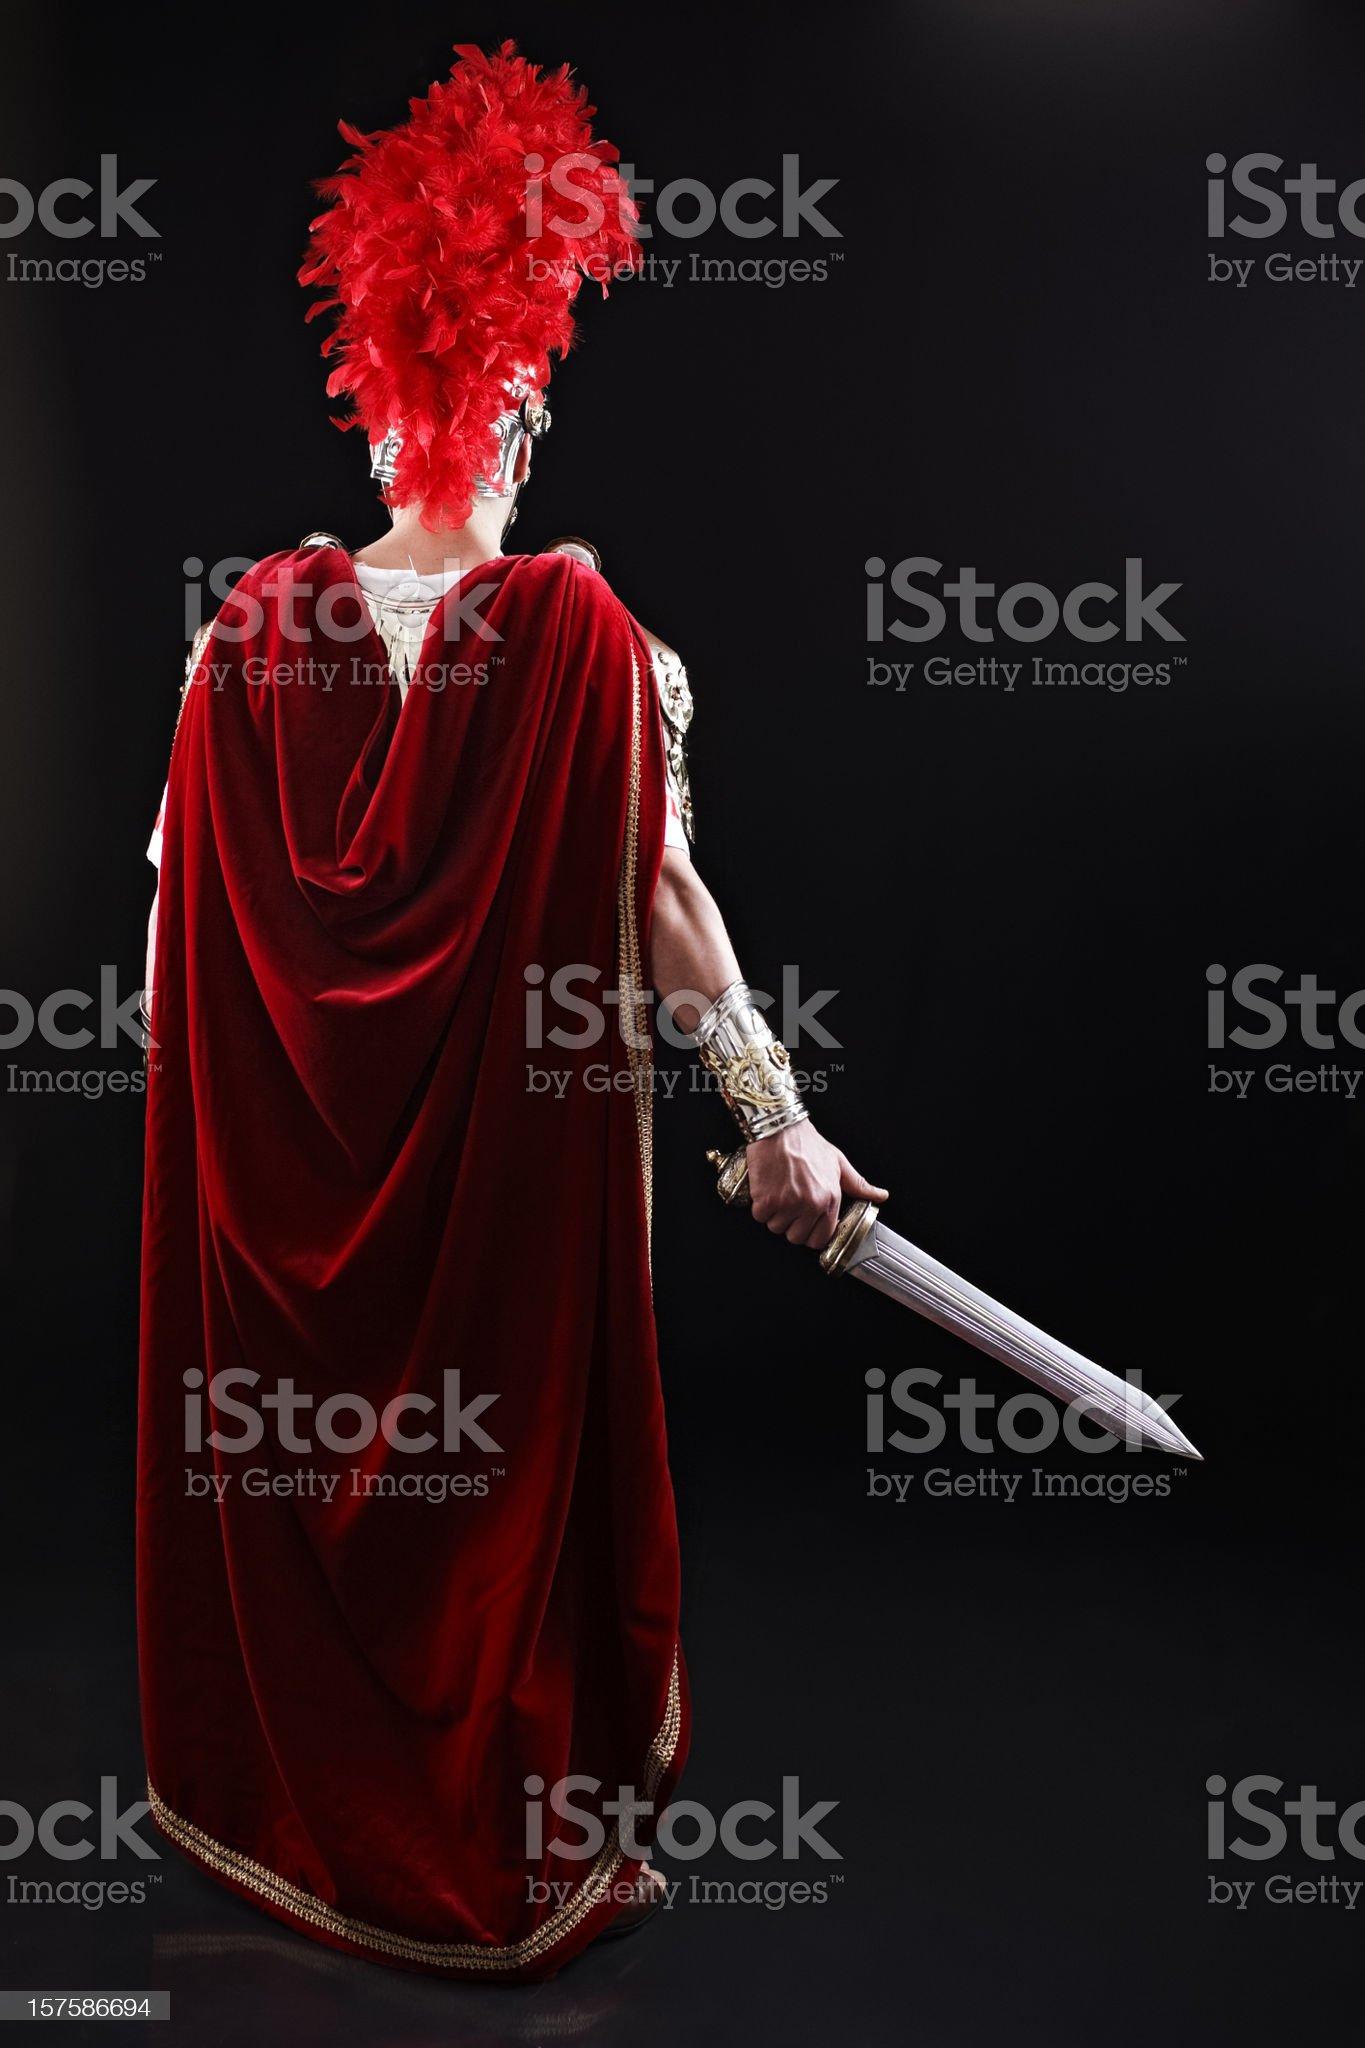 Centurion royalty-free stock photo